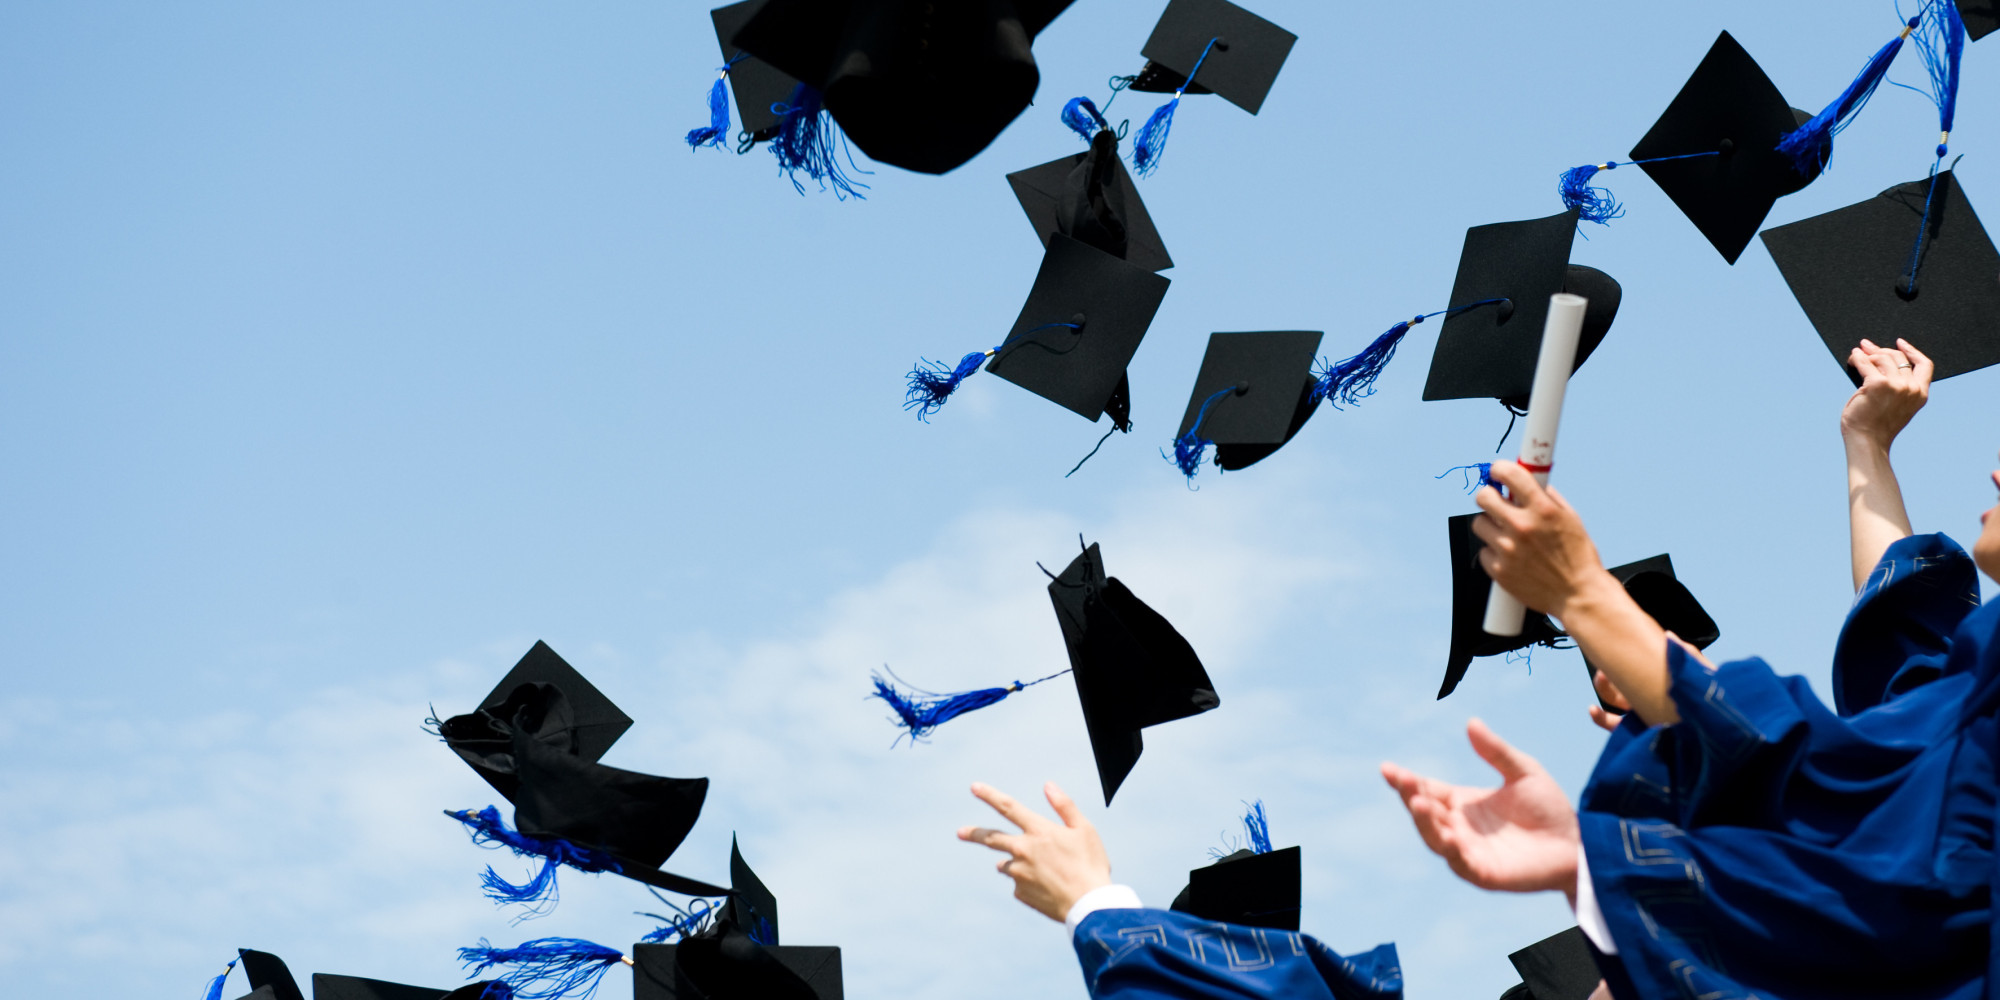 eskow free higher education